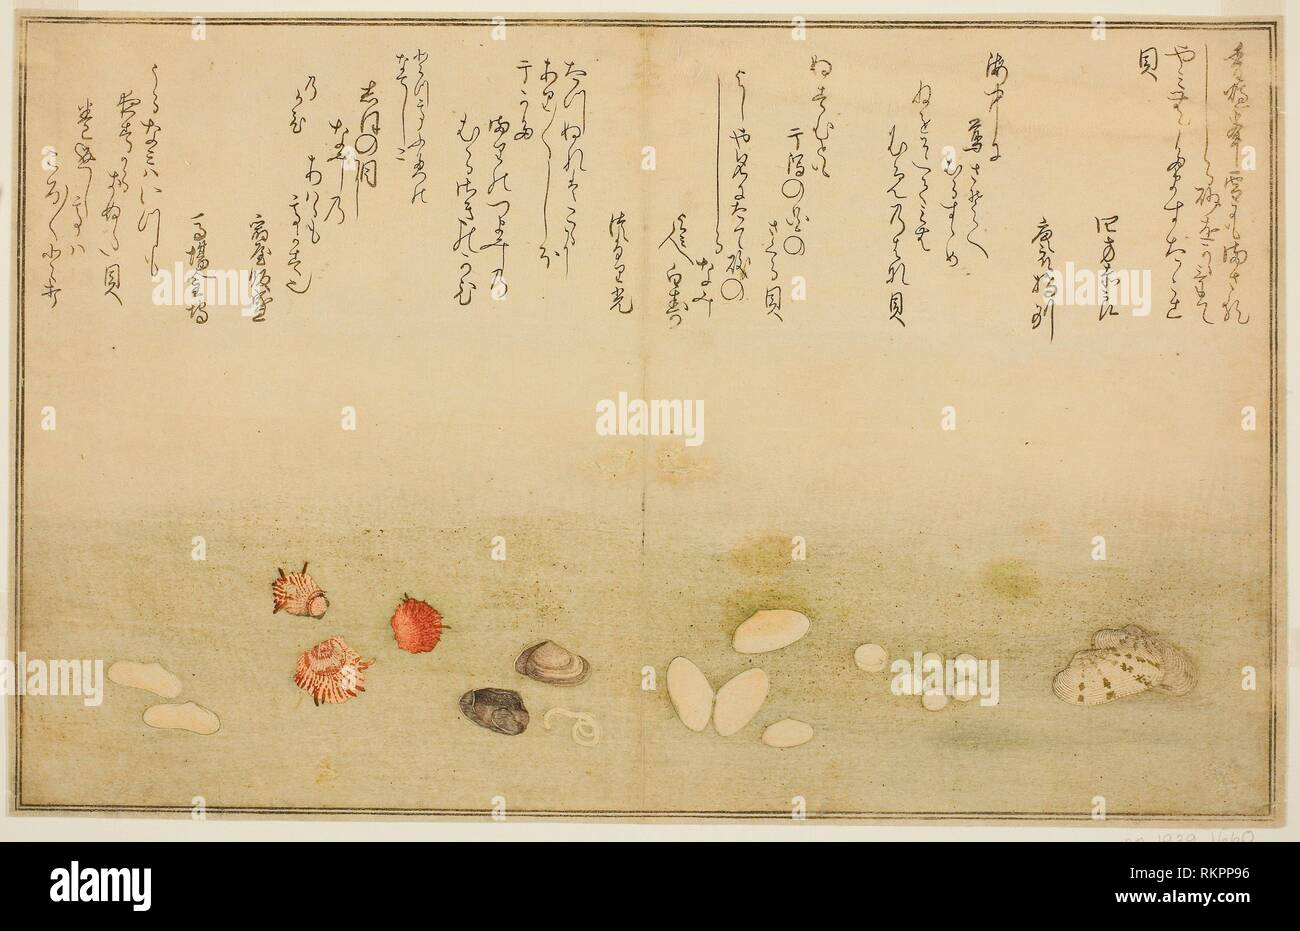 Sudare-gai, hana-gai, sakura-gai, mumeno-gai, nadeshiko-gai, and kinuta-gai, from the illustrated book ''Gifts from the Ebb Tide (Shiohi no tsuto)'' - Stock Image